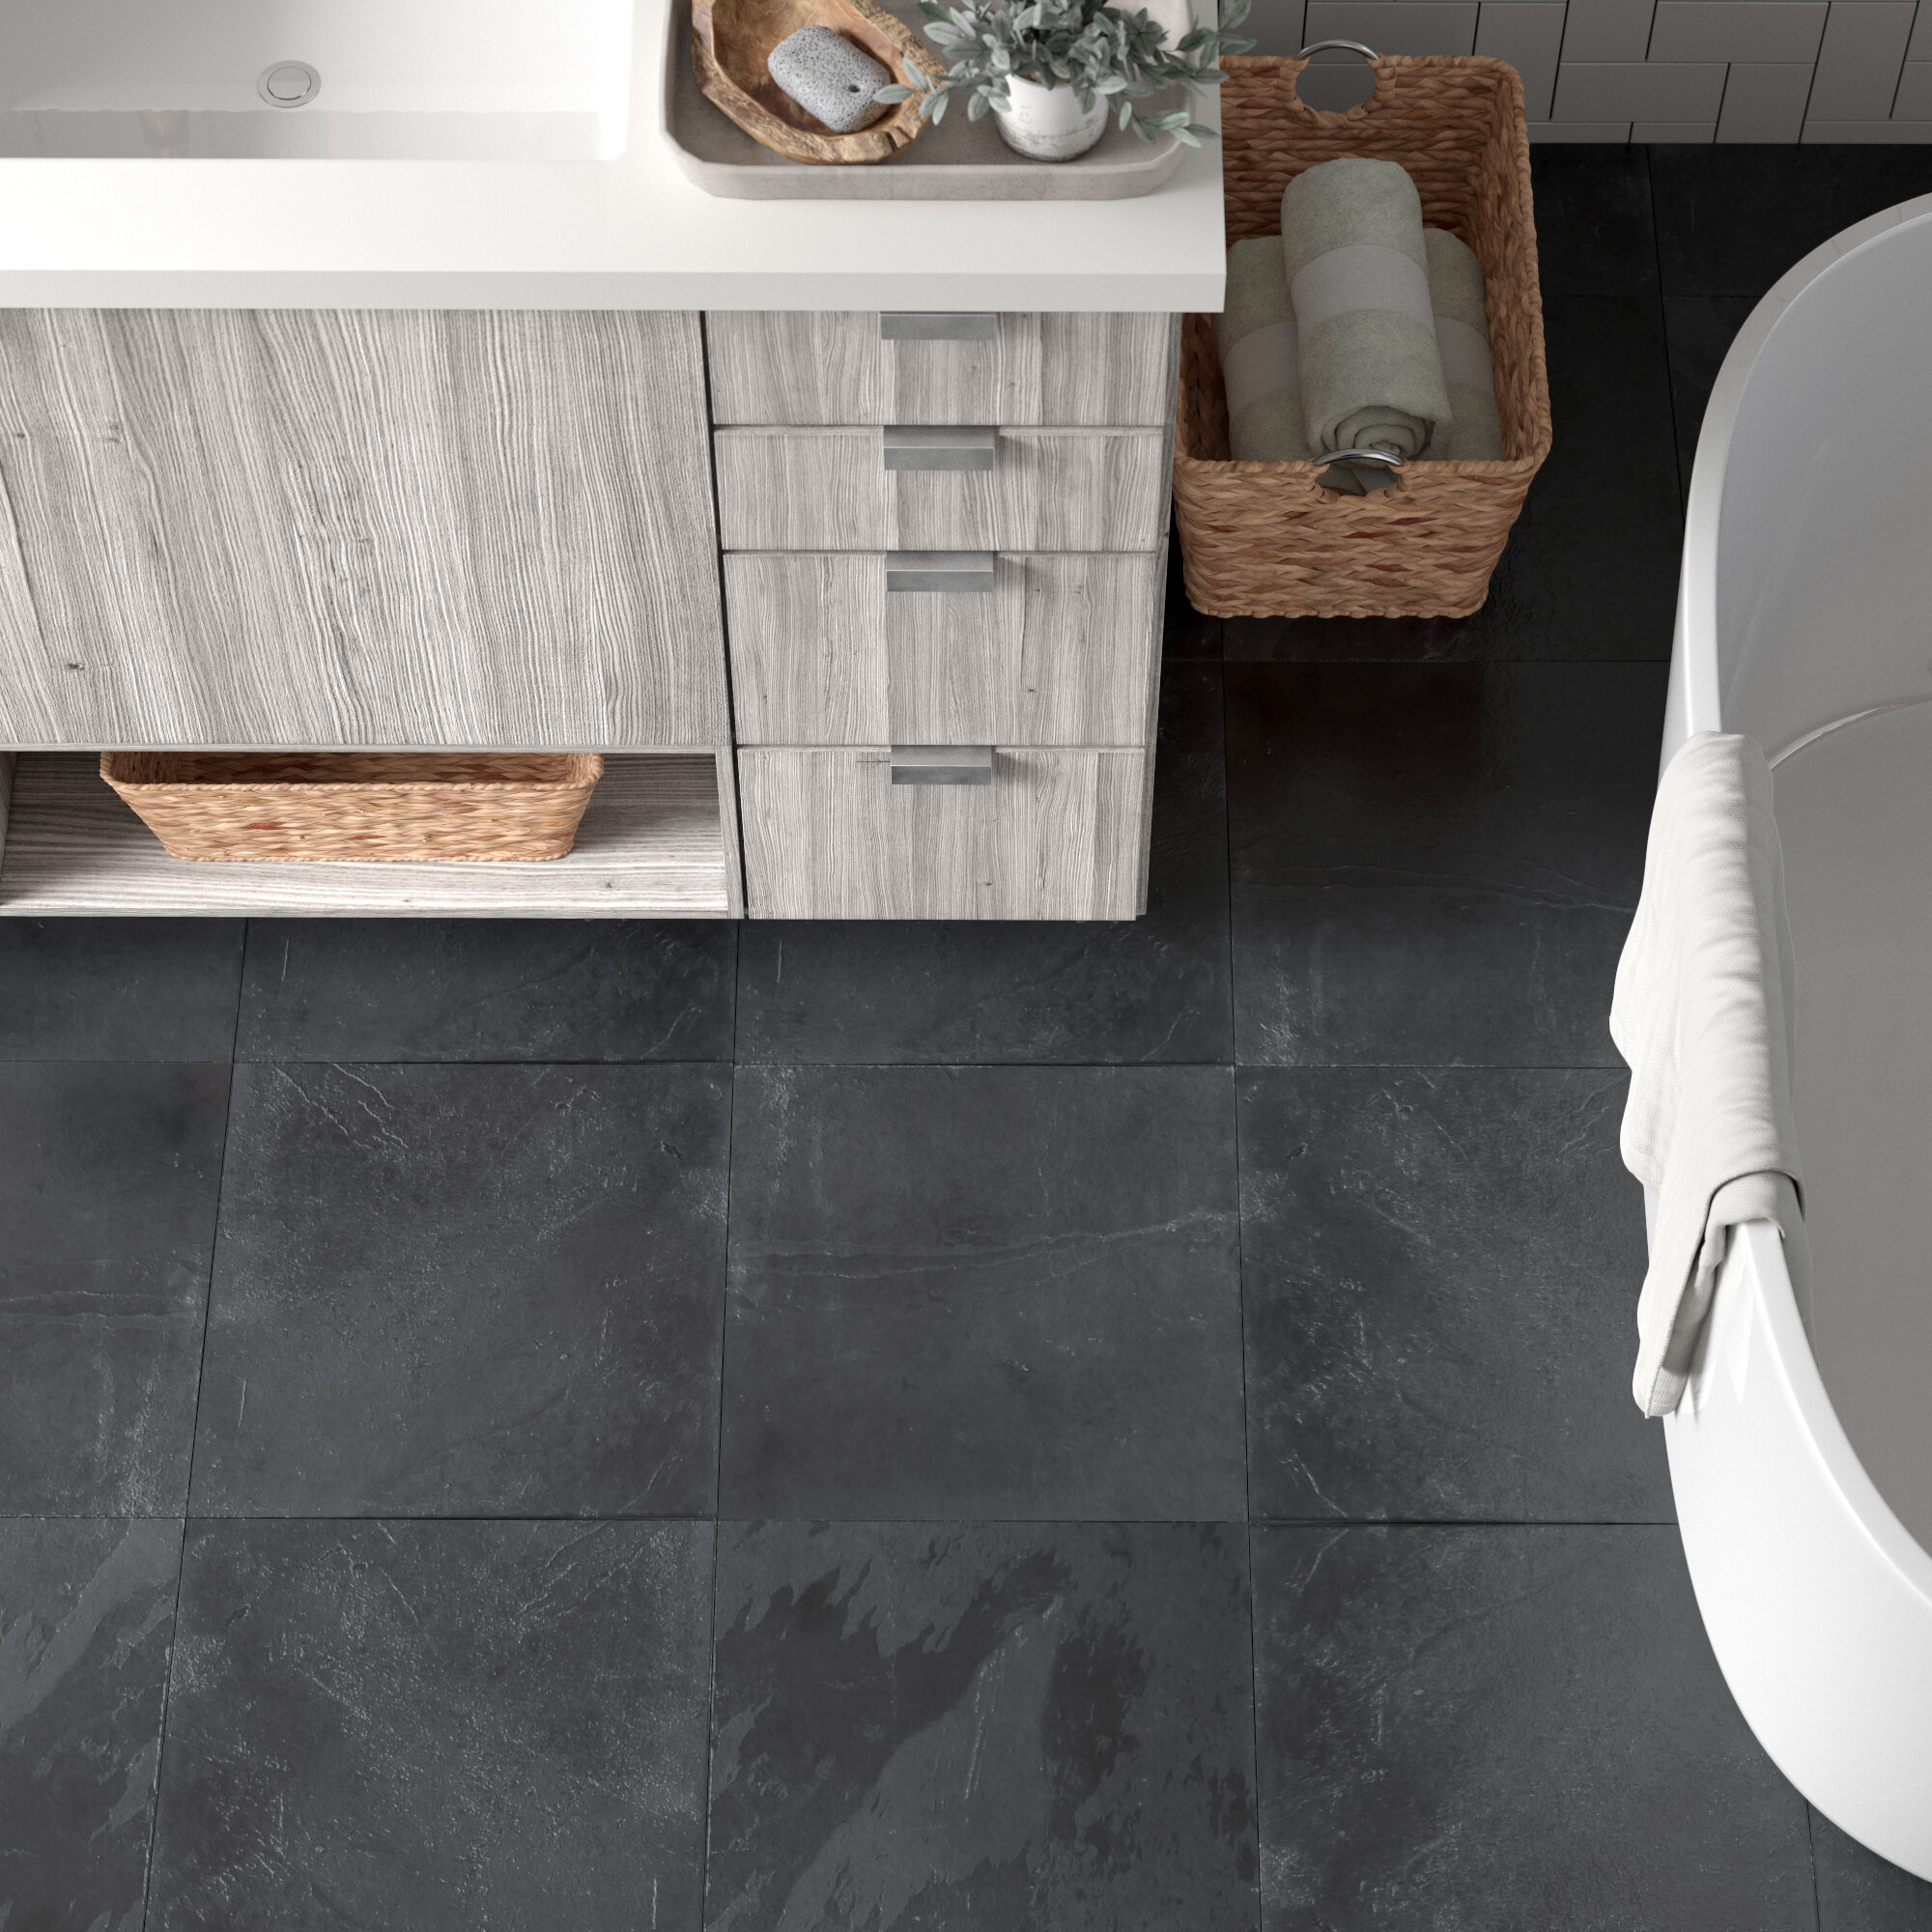 Slate Bathroom Tile You Ll Love In 2021 Wayfair